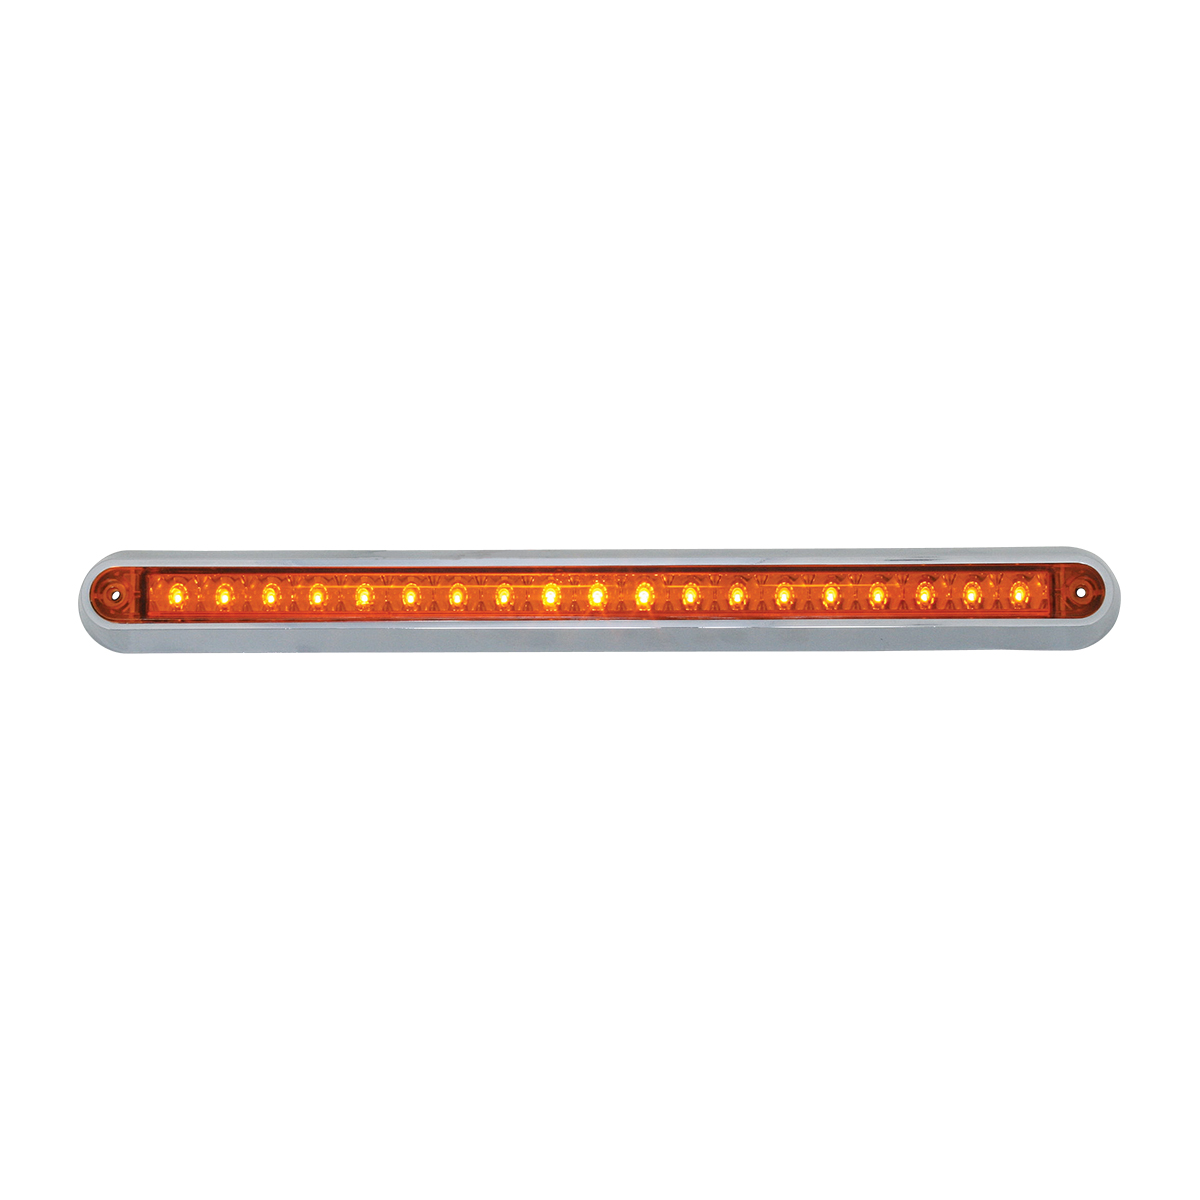 "76290 12"" Surface Mount Light Bar with Chrome Plastic Base"